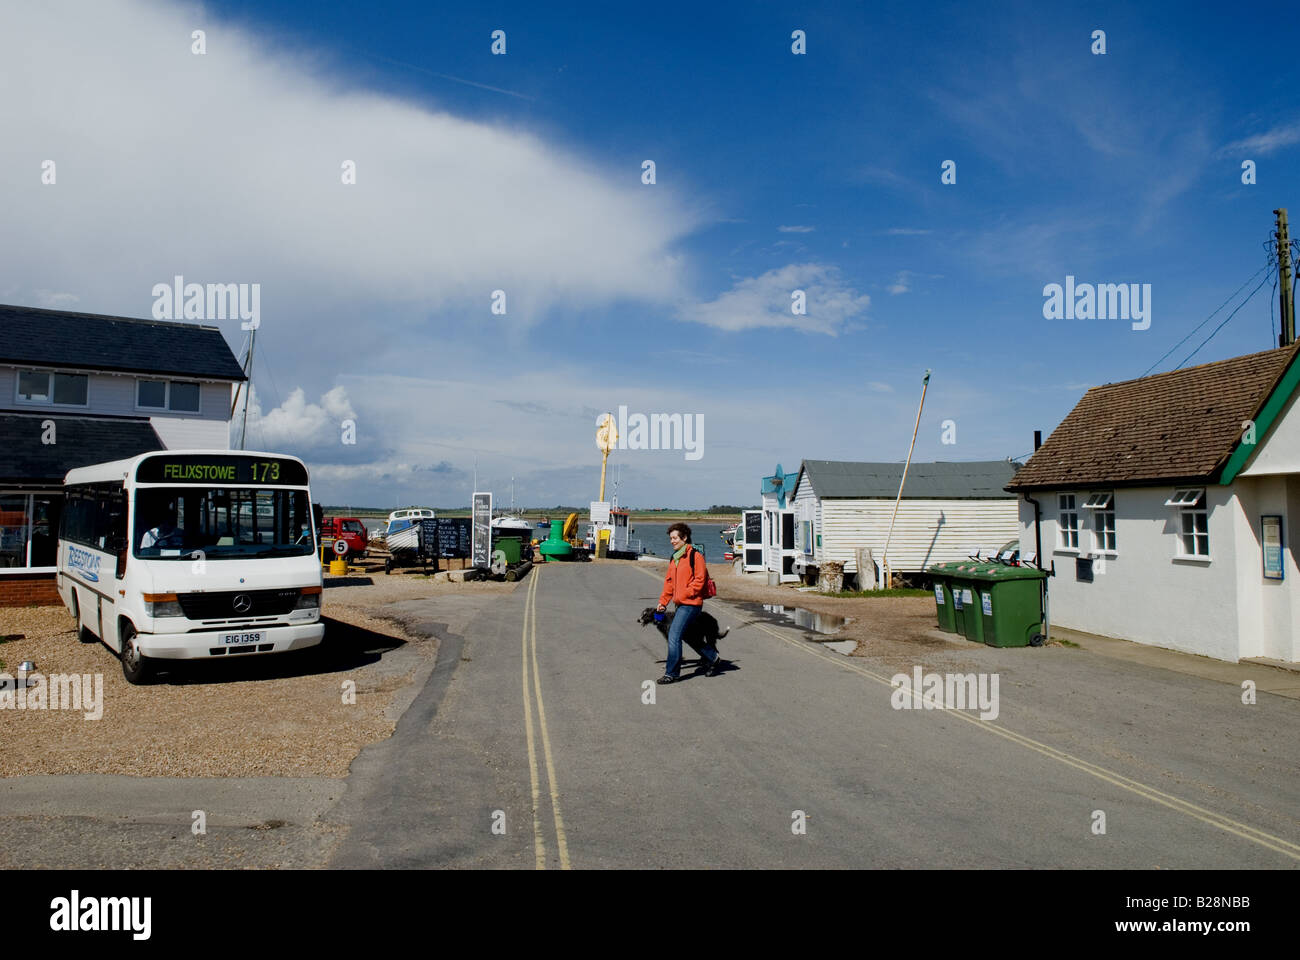 Felixstowe Ferry, Suffolk, UK. - Stock Image